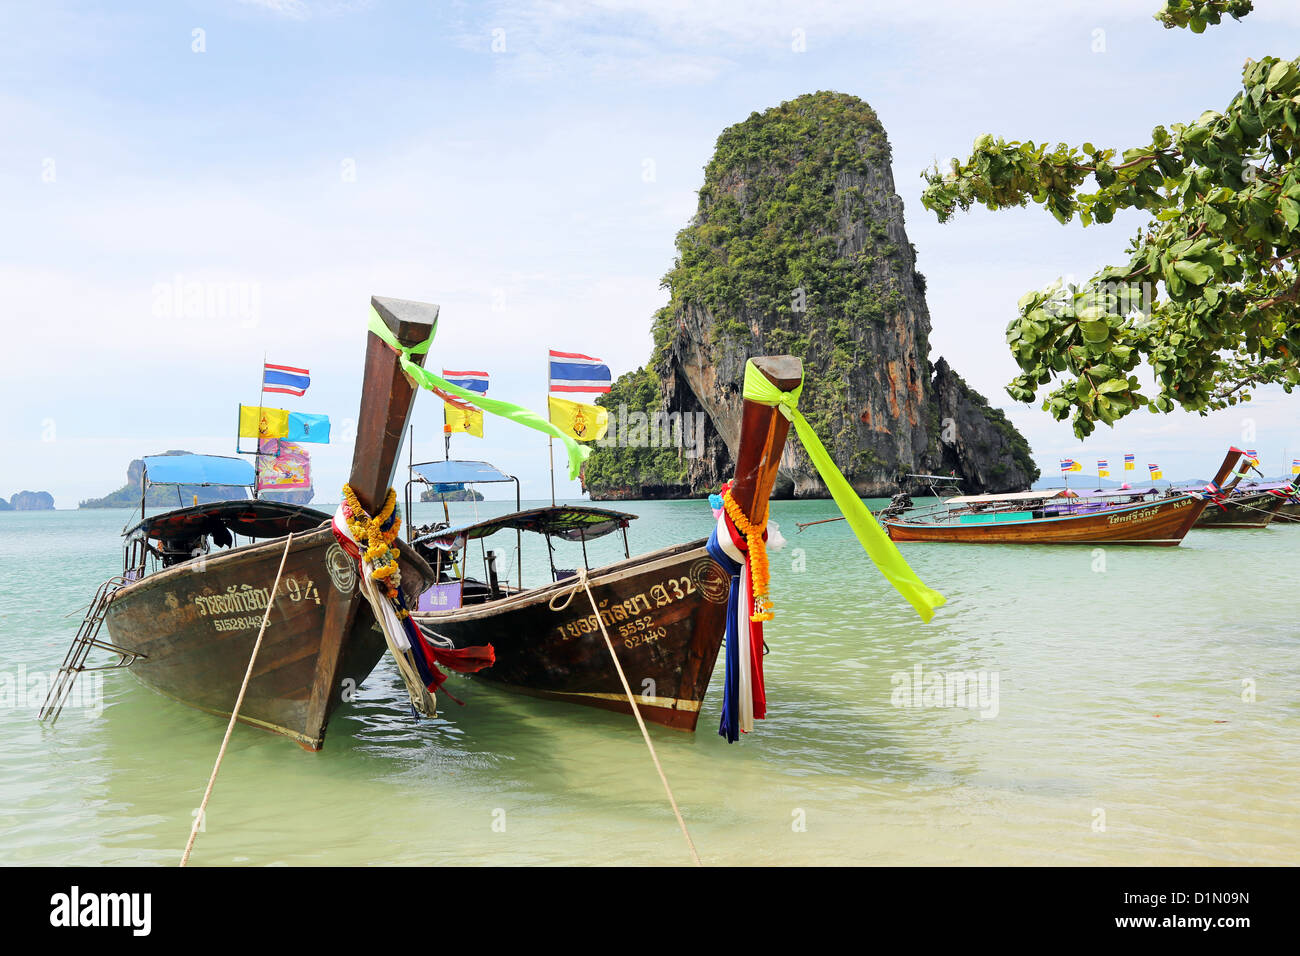 Tailandese tradizionale long tail imbarcazioni al Phranang Cave Beach, Railay Beach, Krabi, Phuket, Tailandia Immagini Stock